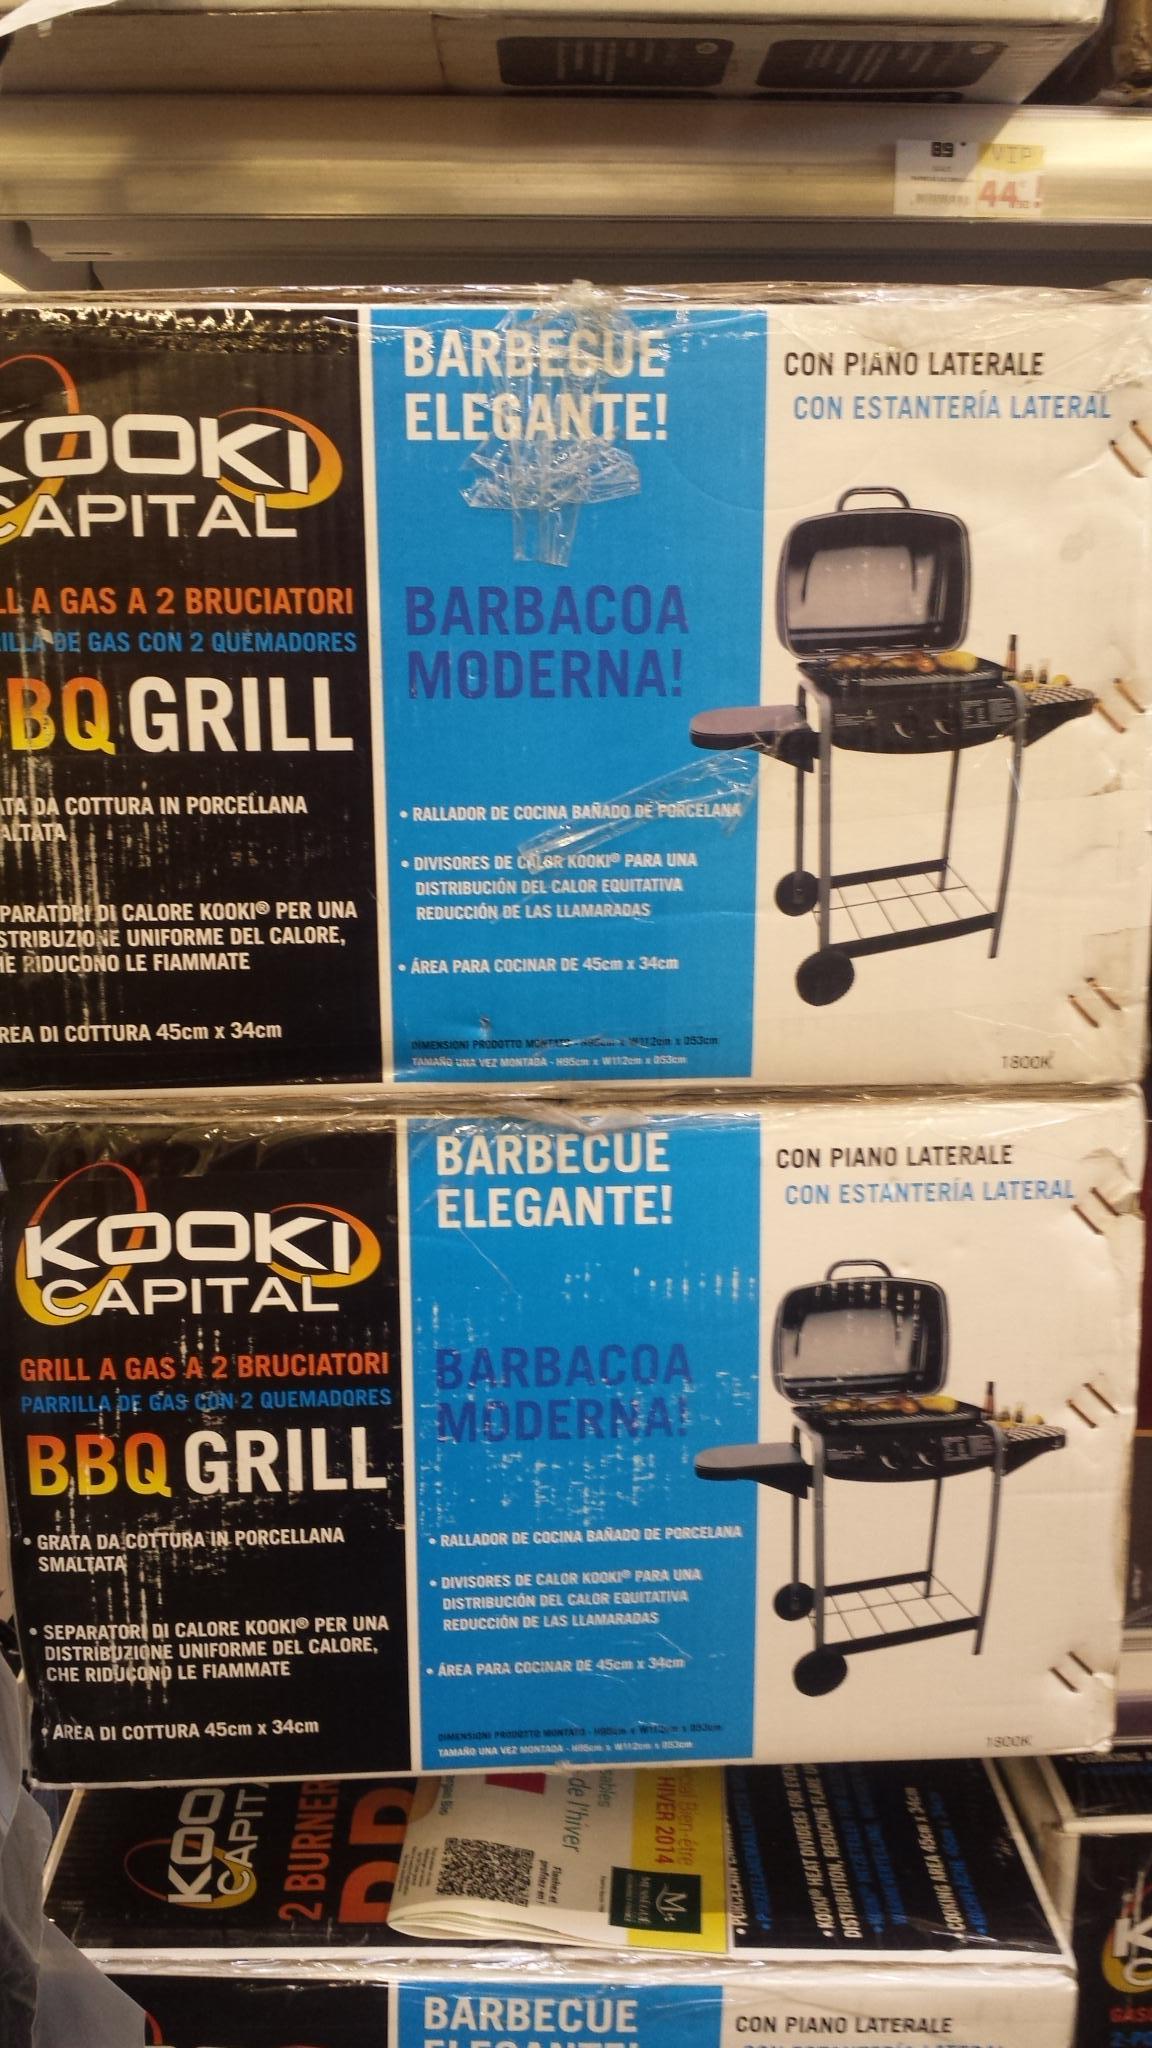 Barbecue à Gaz Kooki Capital